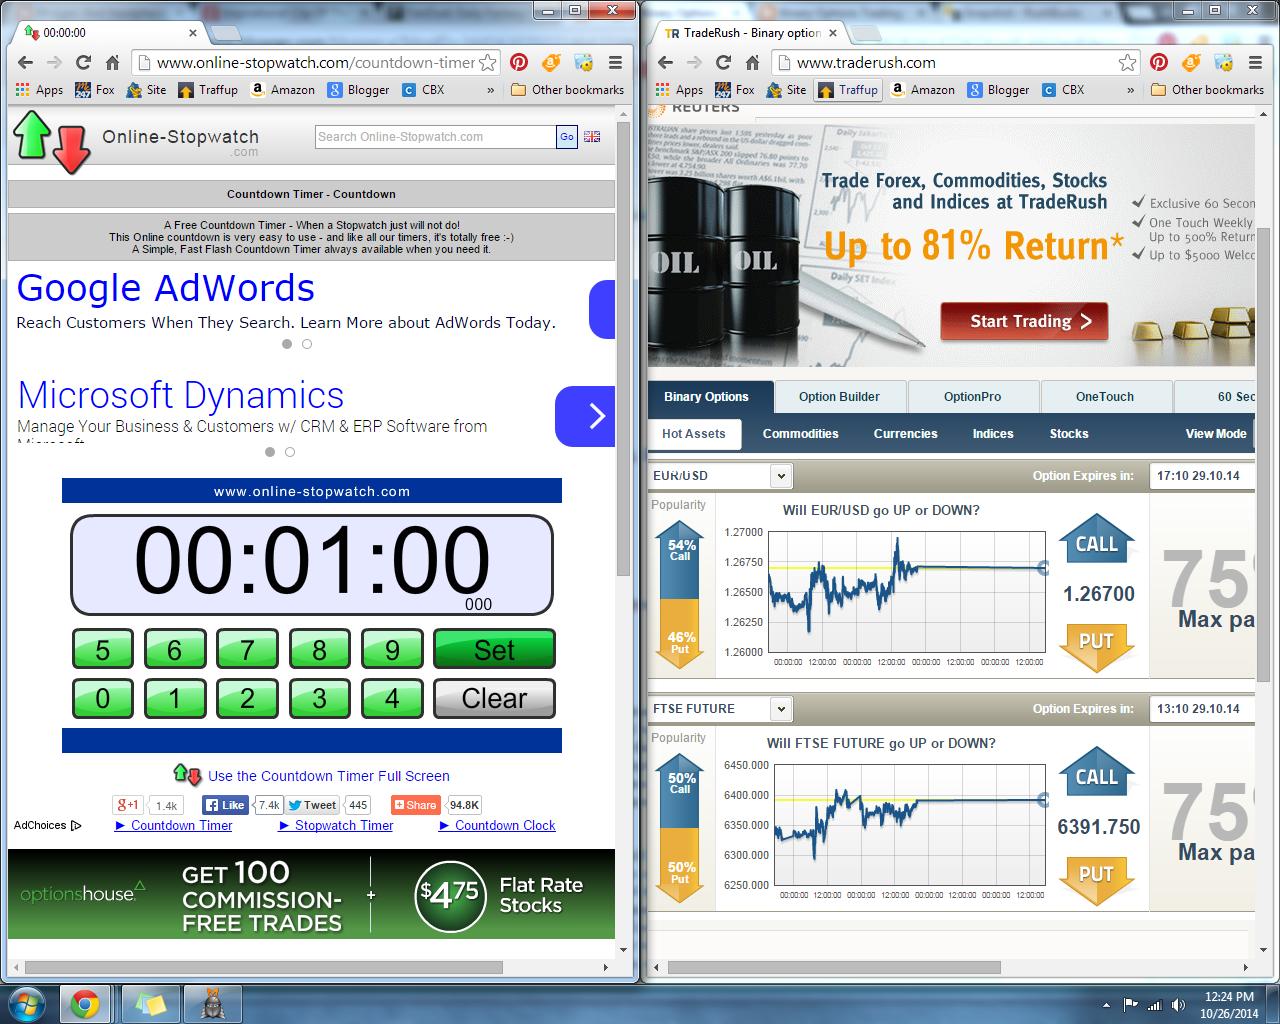 globex bank forex malaysia blogspot